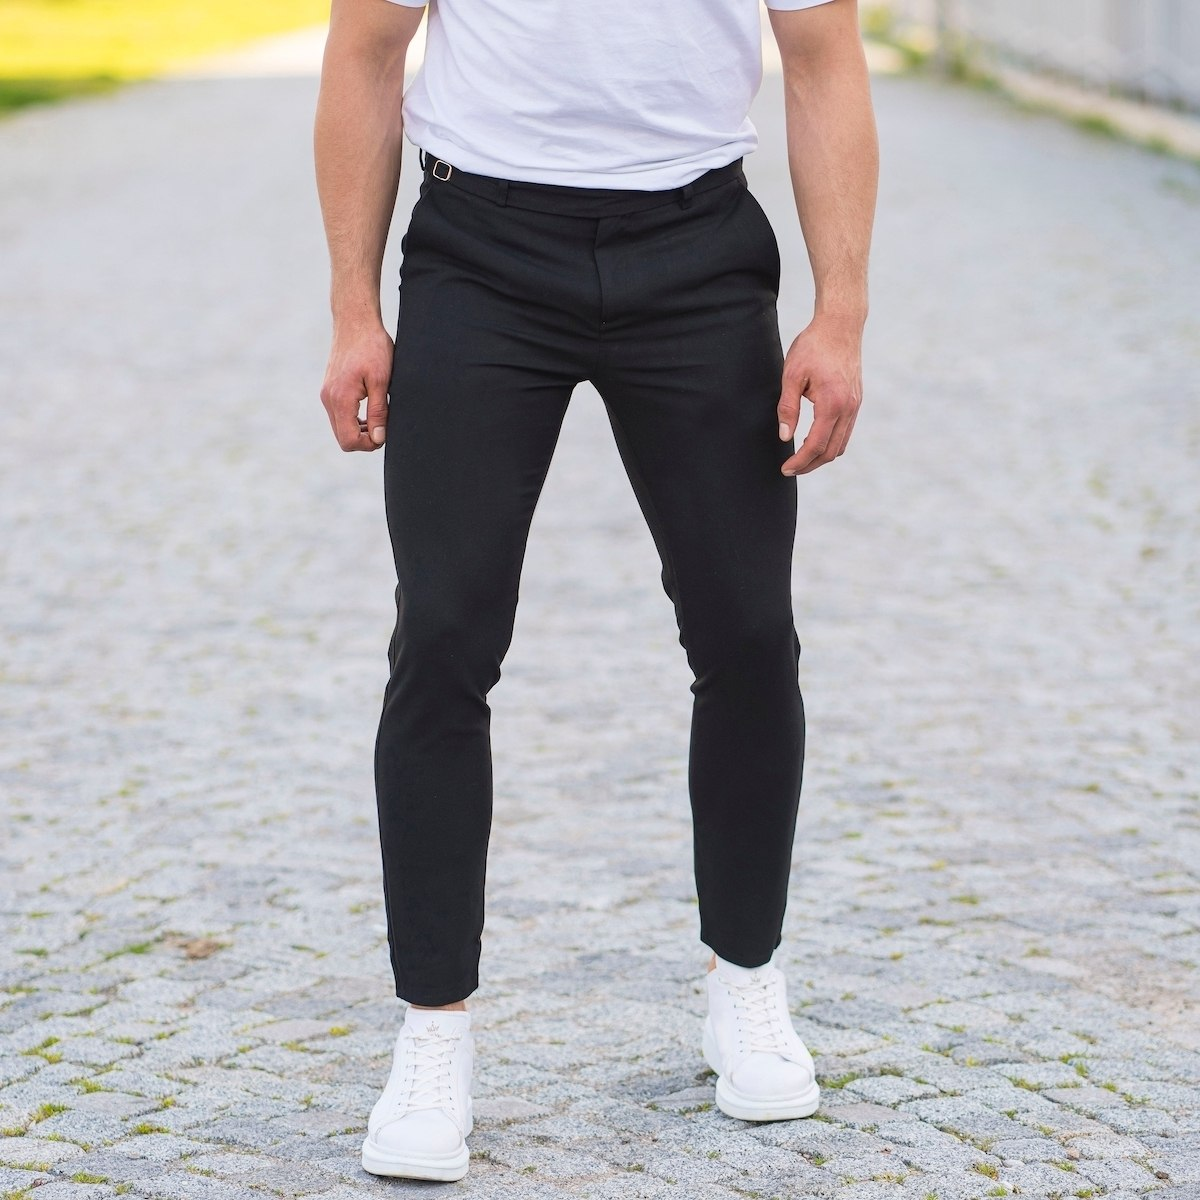 Black Casual Slim-Fit...